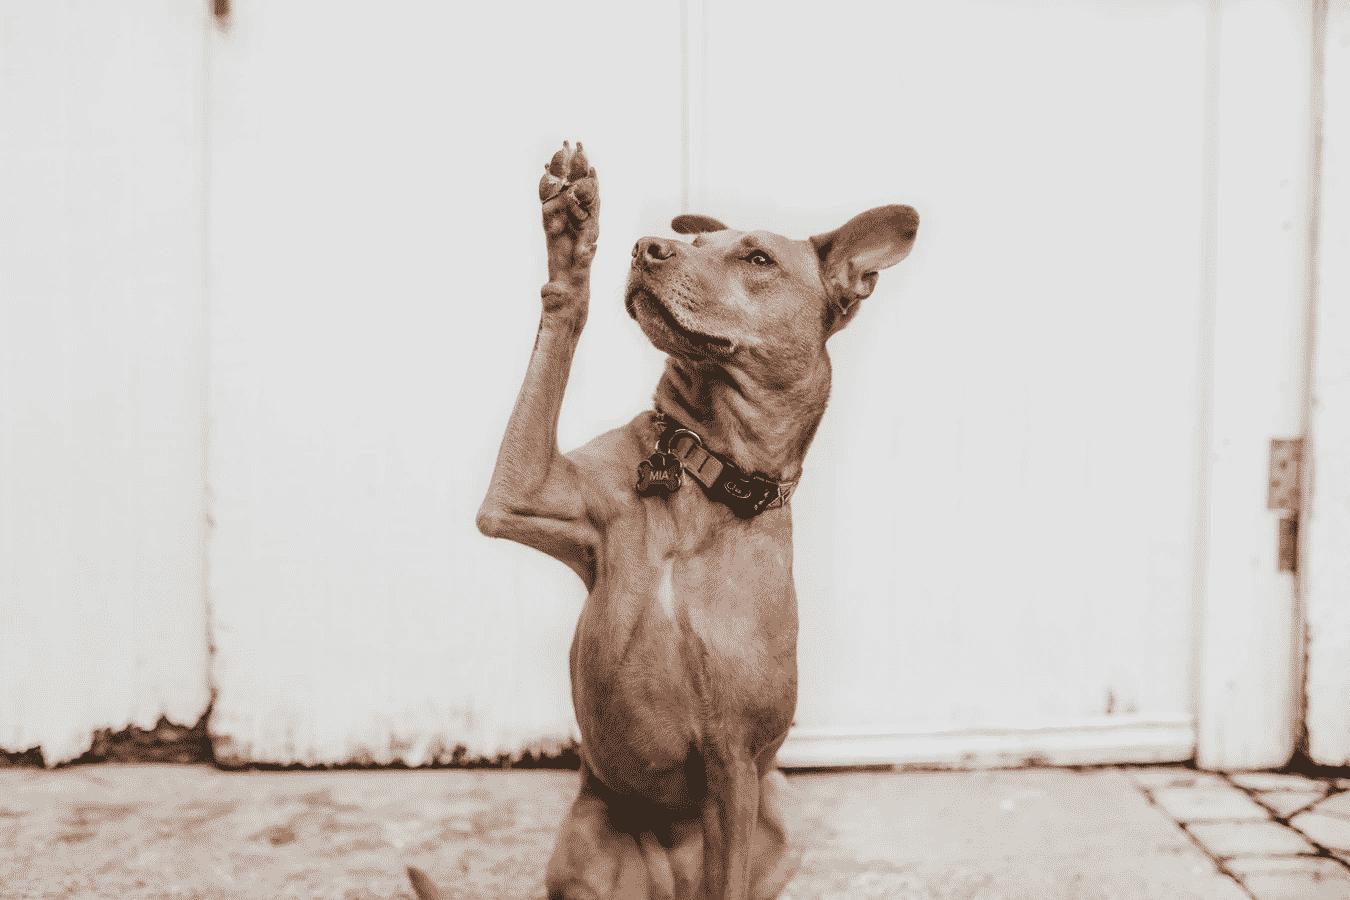 Dog's high five